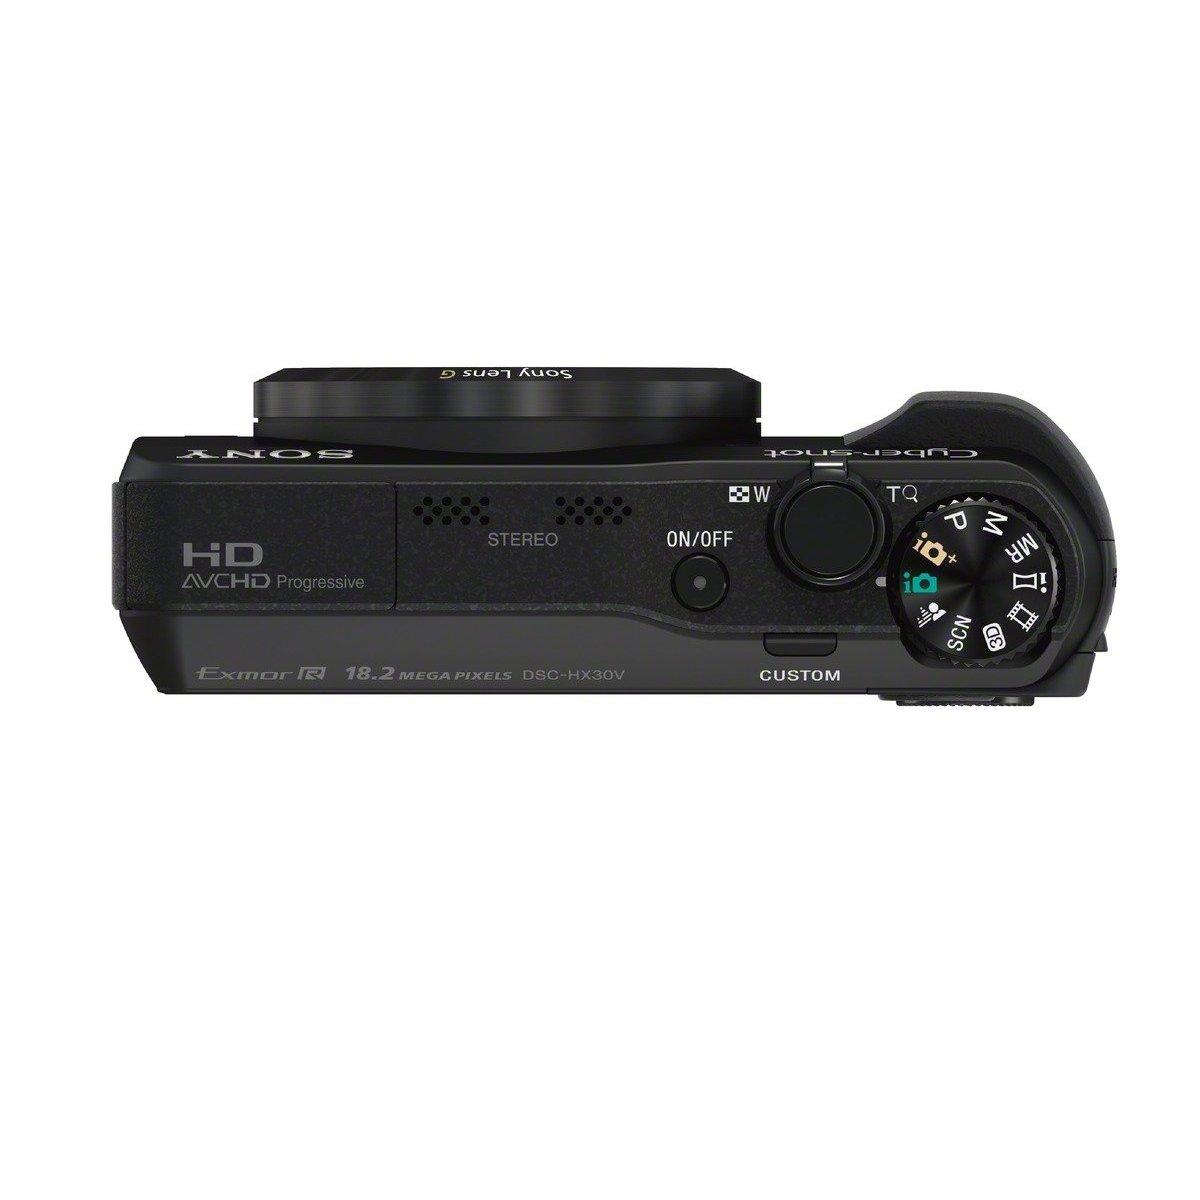 https://thetechjournal.com/wp-content/uploads/images/1203/1331279239-sony-cybershot-dschx30v-182-mp-exmor-r-cmos-digital-camera-13.jpg